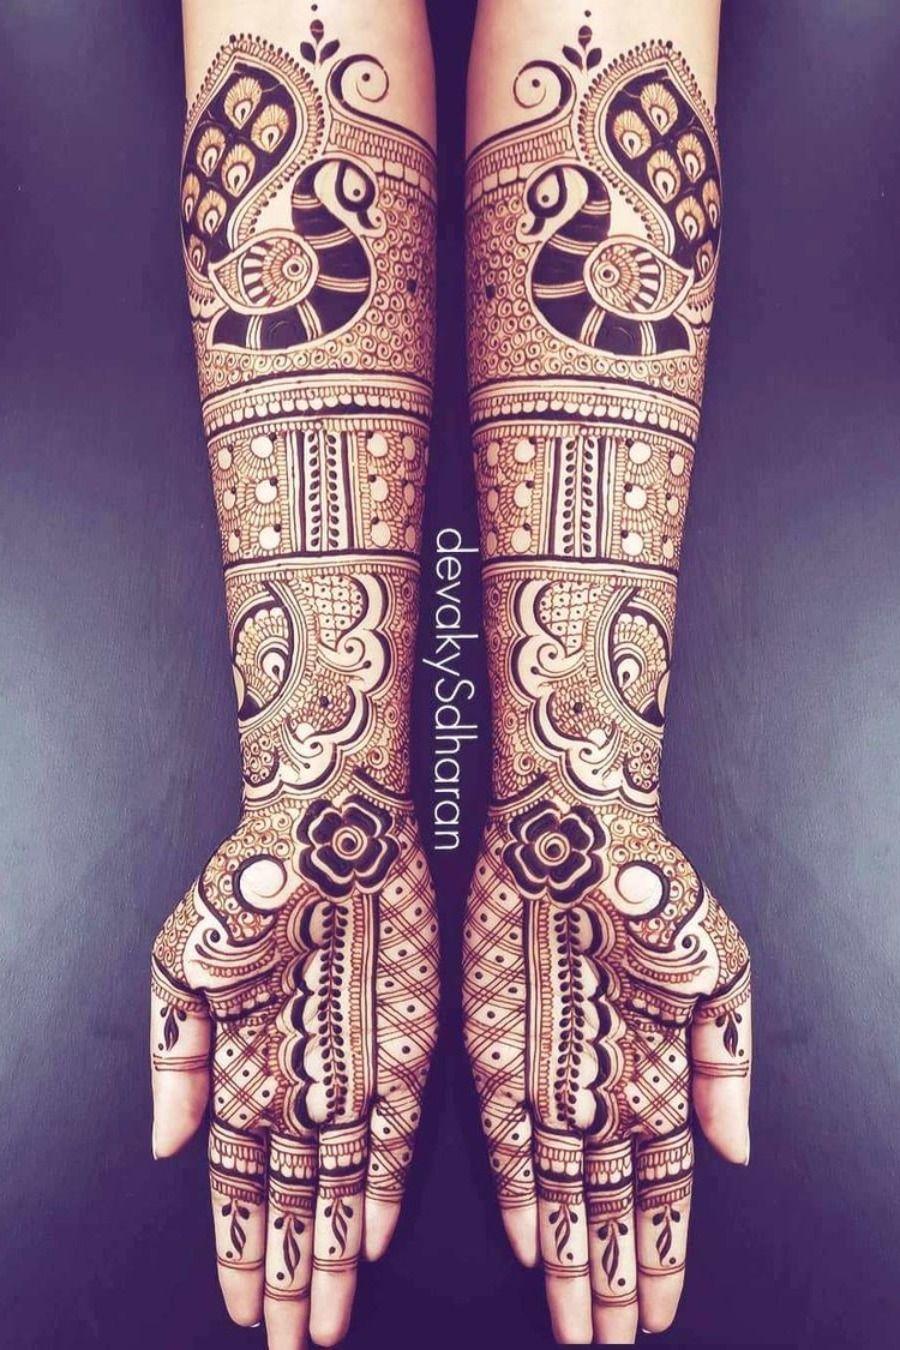 Looking for more such intricate Mehendi designs? Head to our blog for latest  Mehndi Inspiration. Click on the link attached below.  #indianwedding #shaadisaga #intimatewedding #bridalfashion #weddingmehendi #bridalmehendi #mehndidesignideas #uniquemehendidesigns